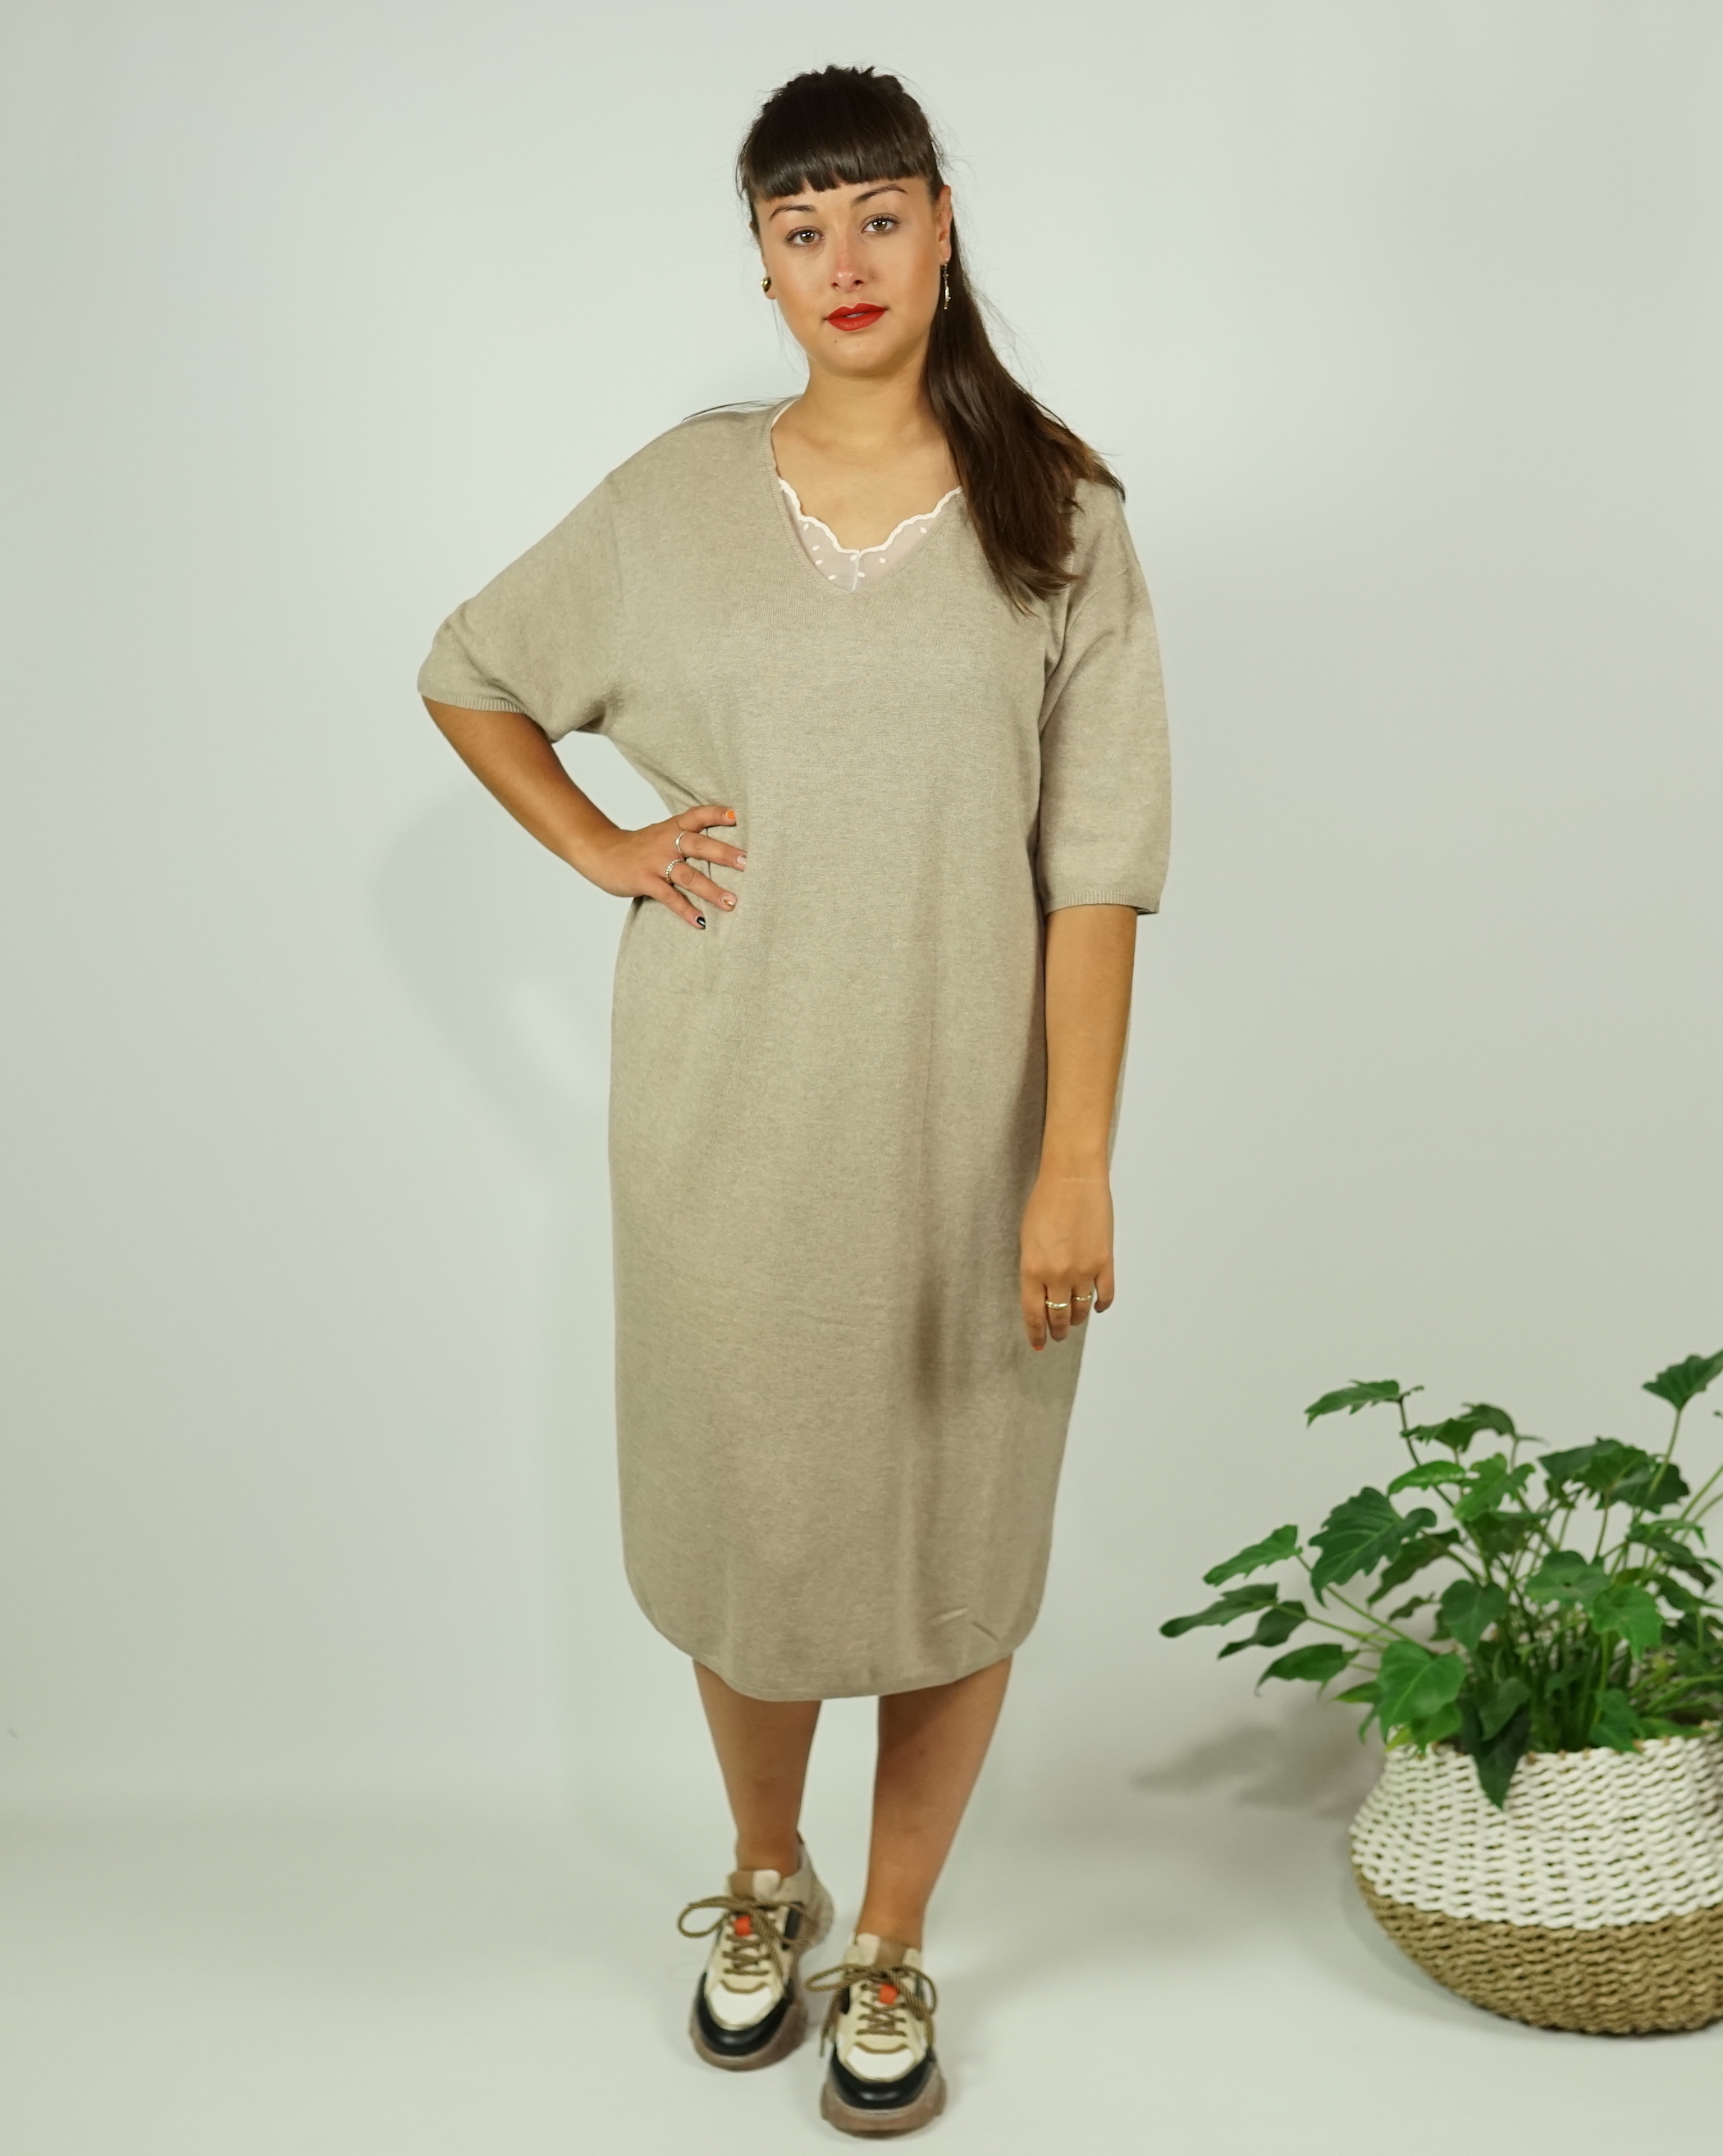 Kleid Strick Evamaria JcSophie